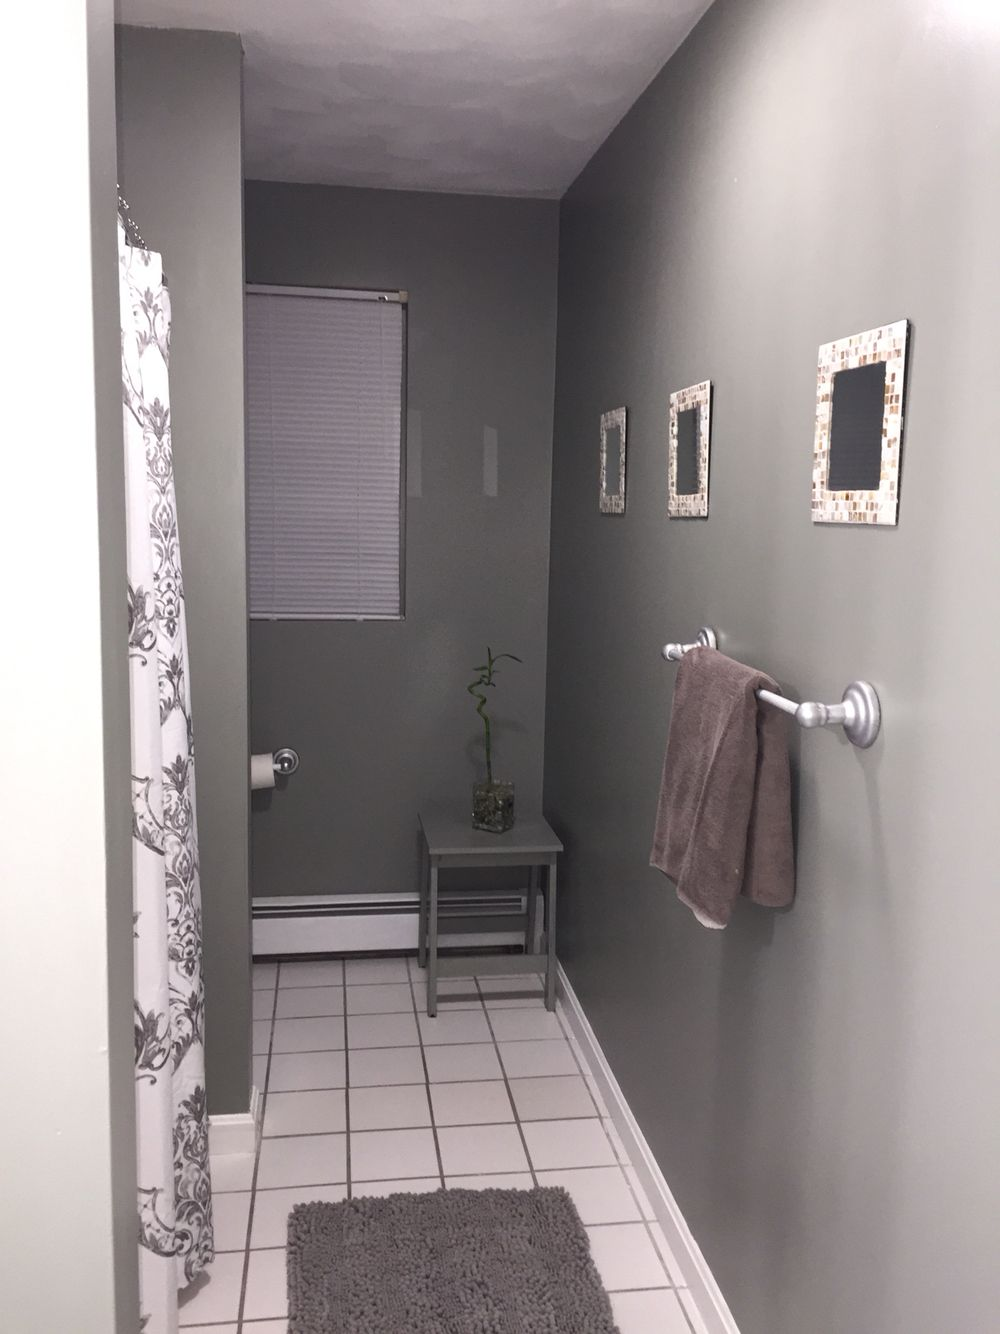 Sherwin Williams Rare Gray Bathroom Terri S Color In Her New Bathroom Home Design Decor Grey Bathrooms Beautiful Bathrooms